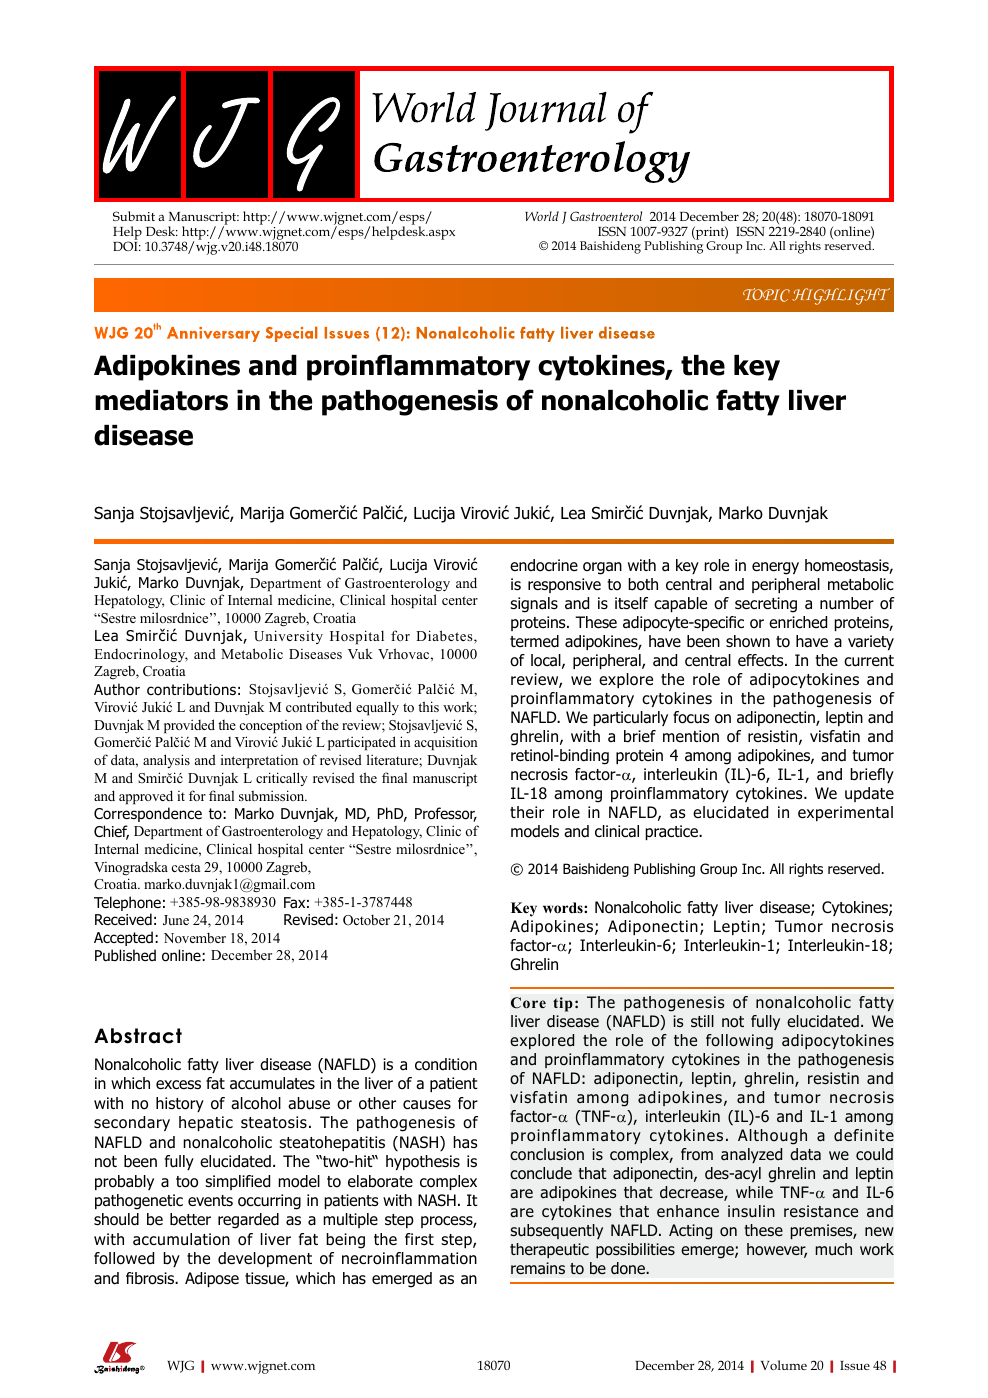 Adipokines and proinflammatory cytokines, the key mediators